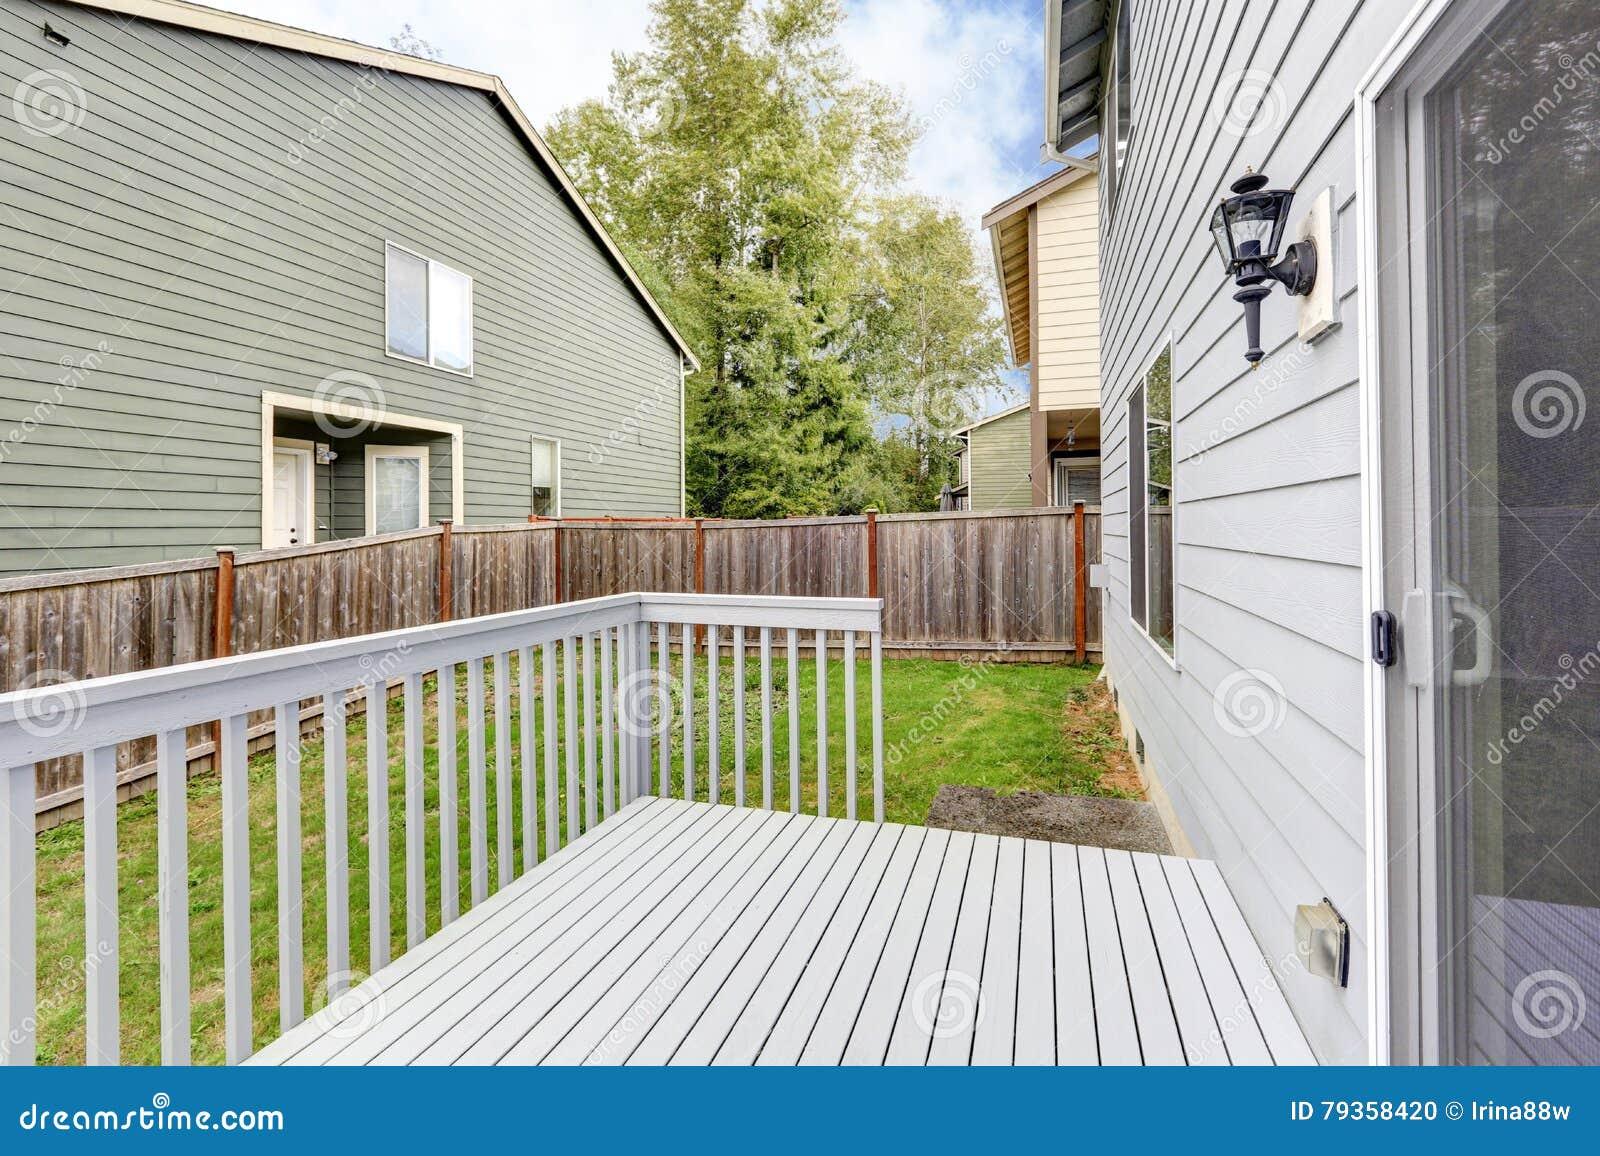 Empty Wooden Backyard Deck Overlooking Neighboring Houses